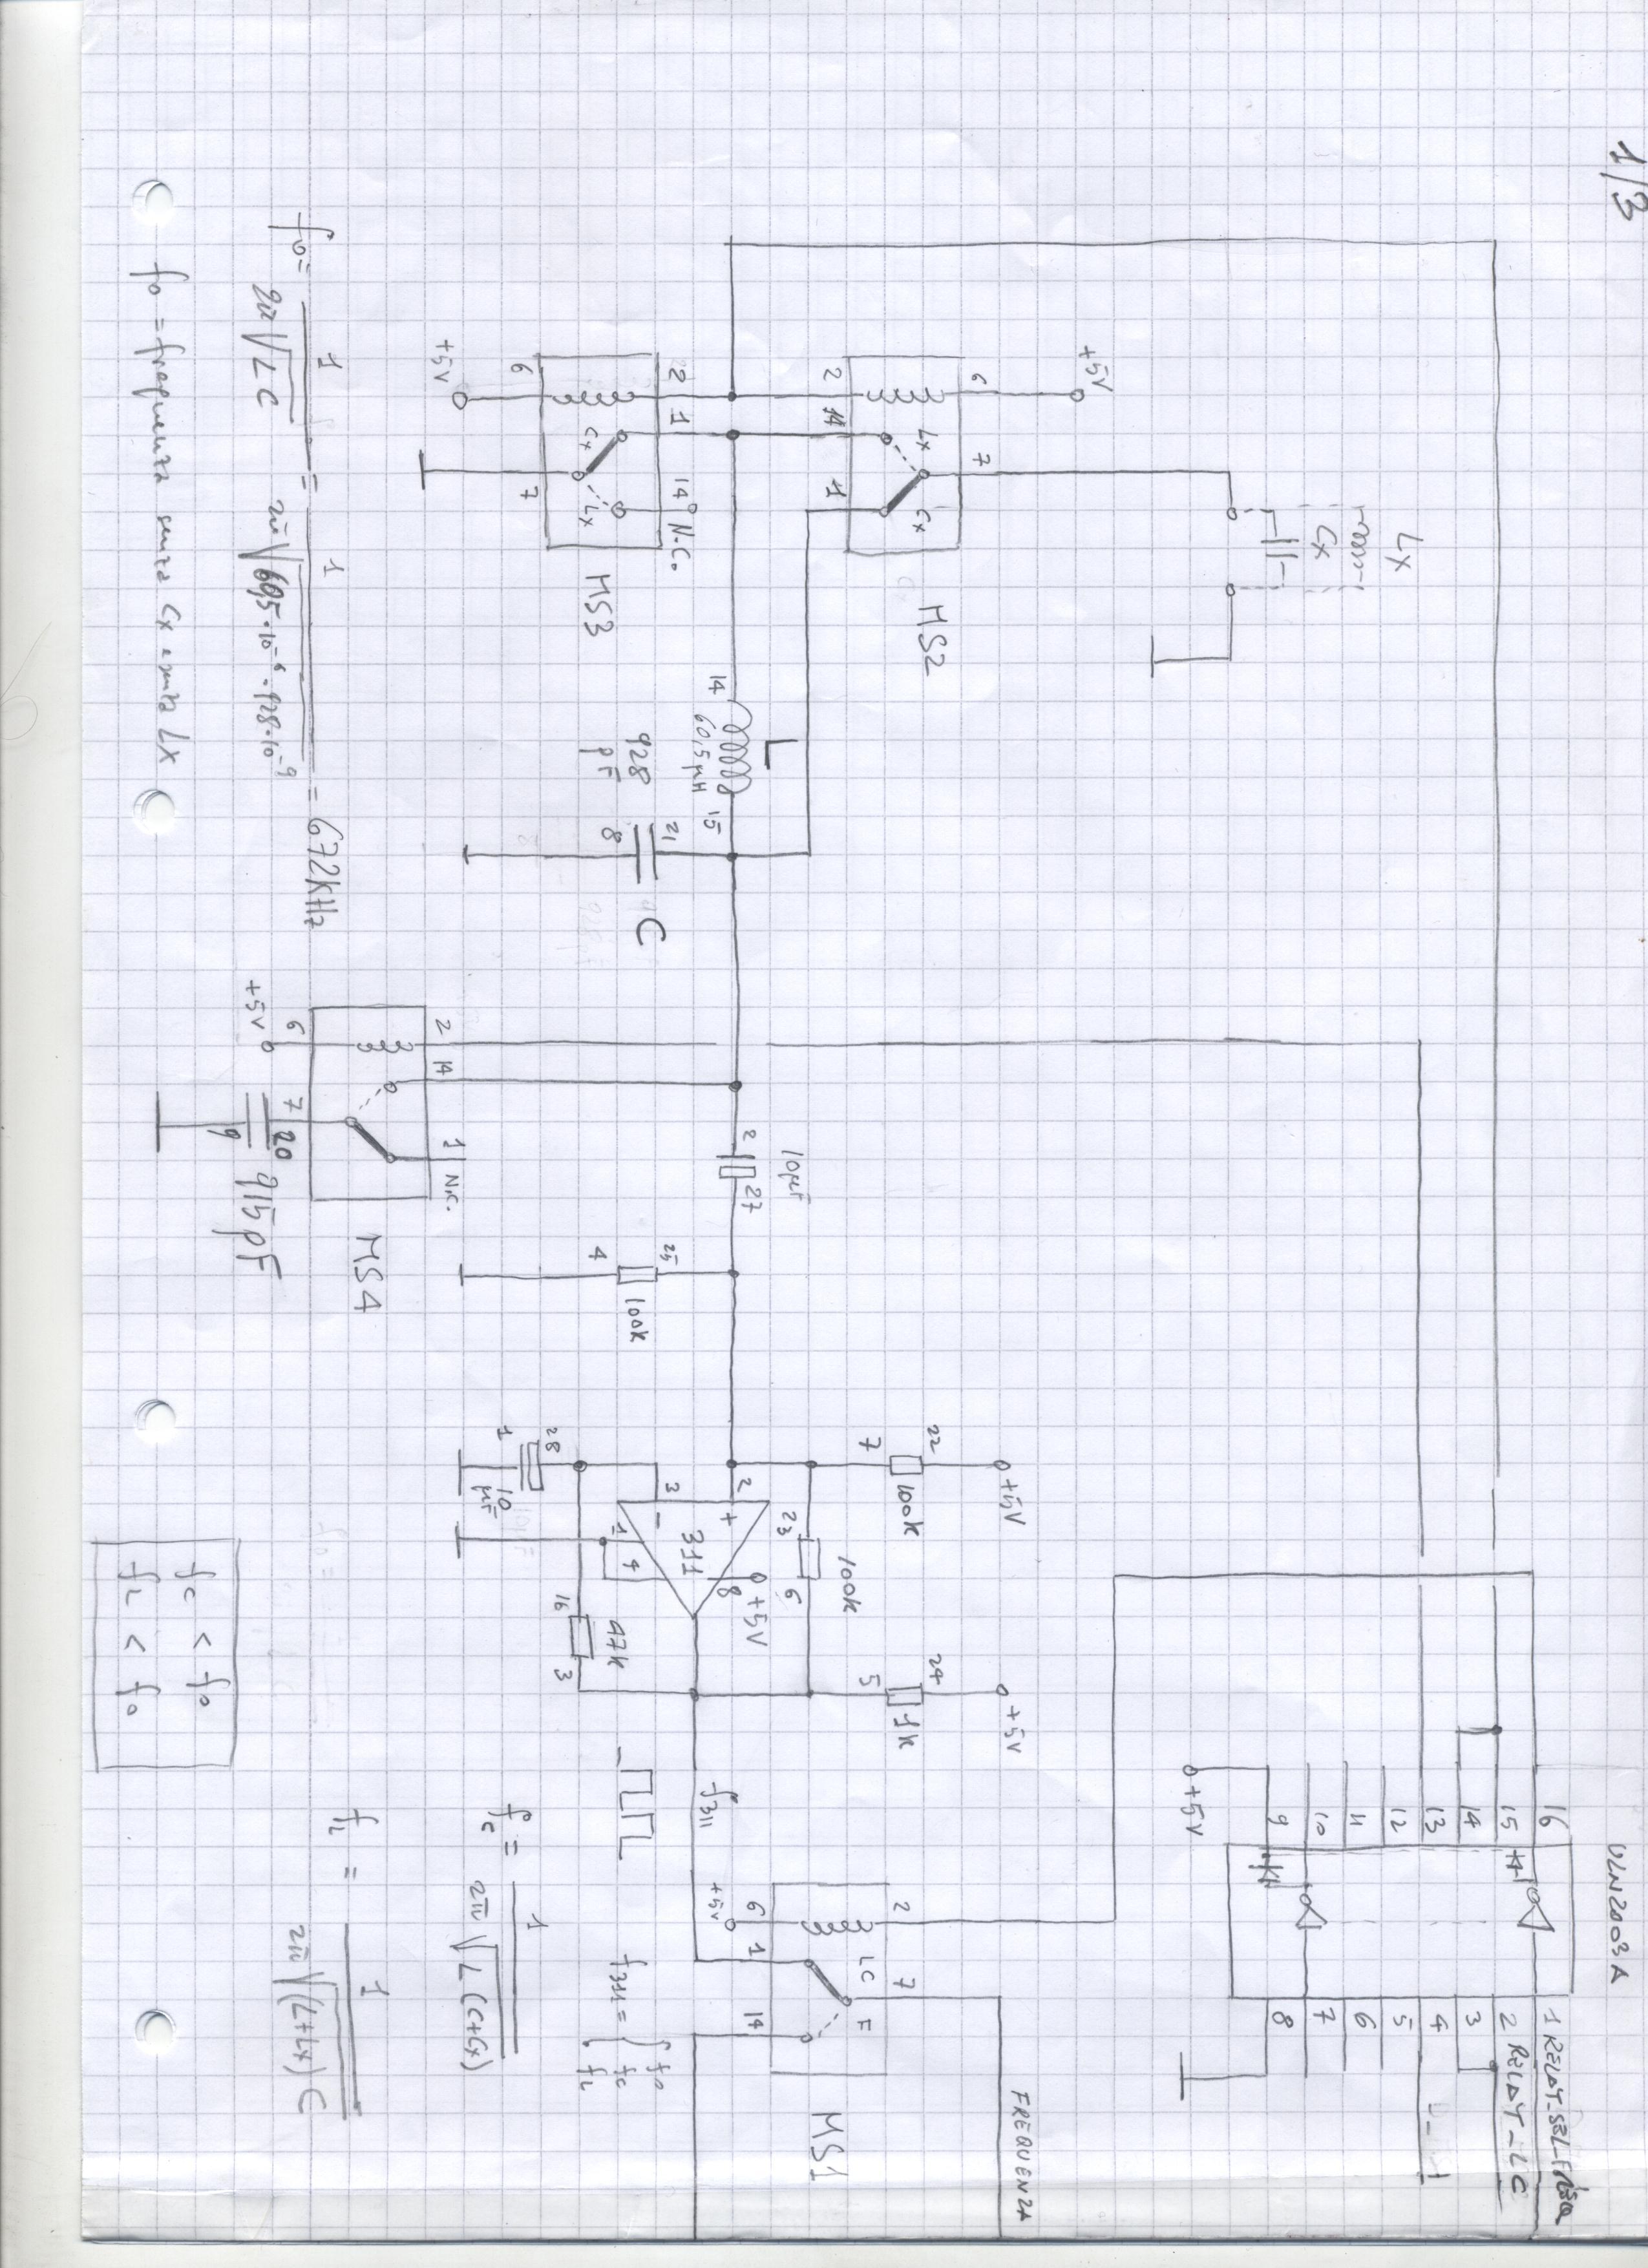 Lc Meter Schematic Giuseppe Talarico